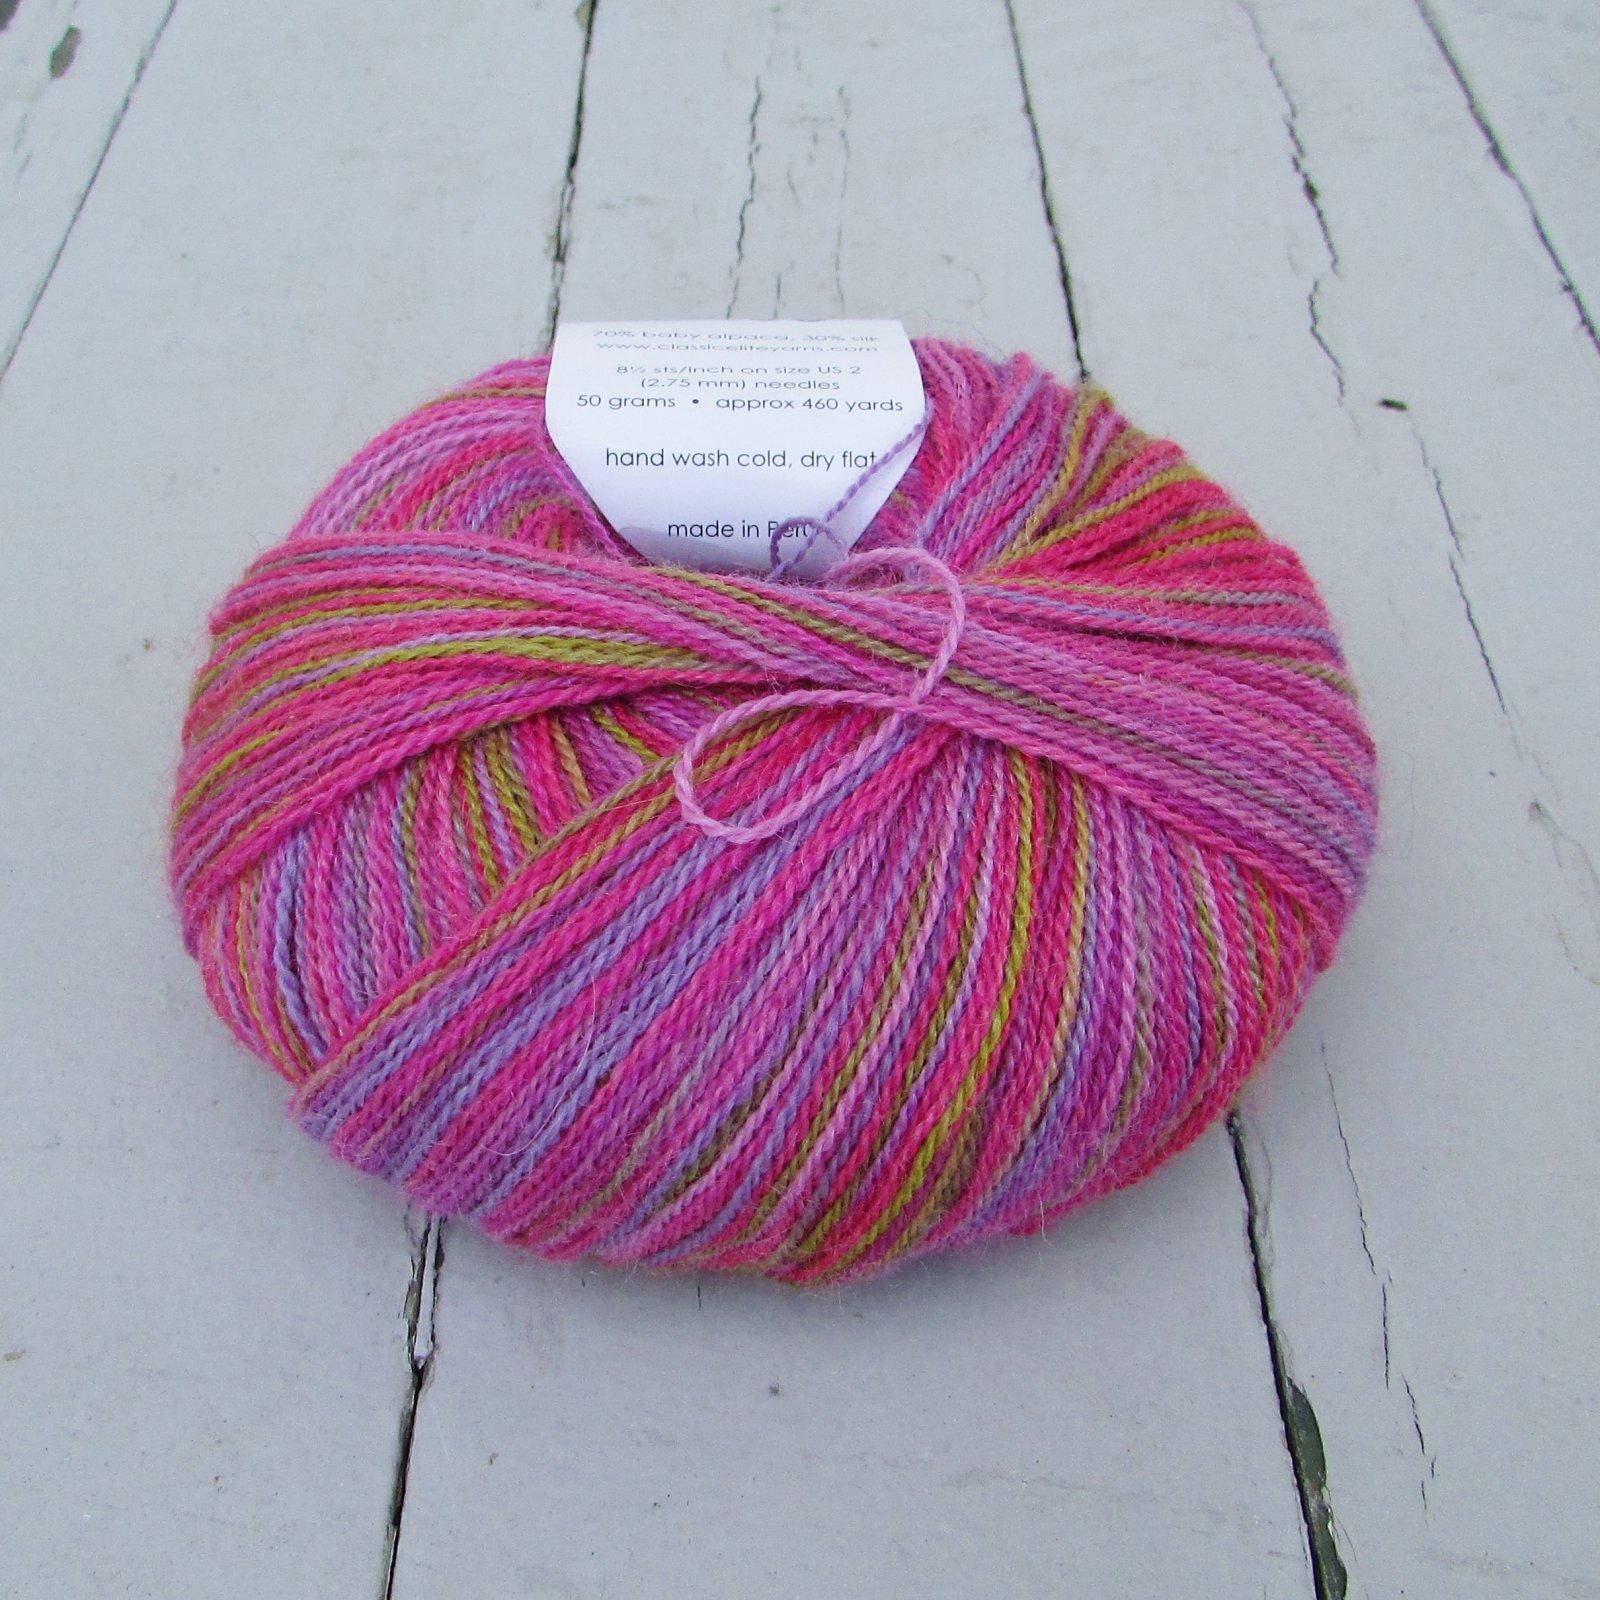 Classic Elite Yarns Silky Alpaca Lace Handpaint